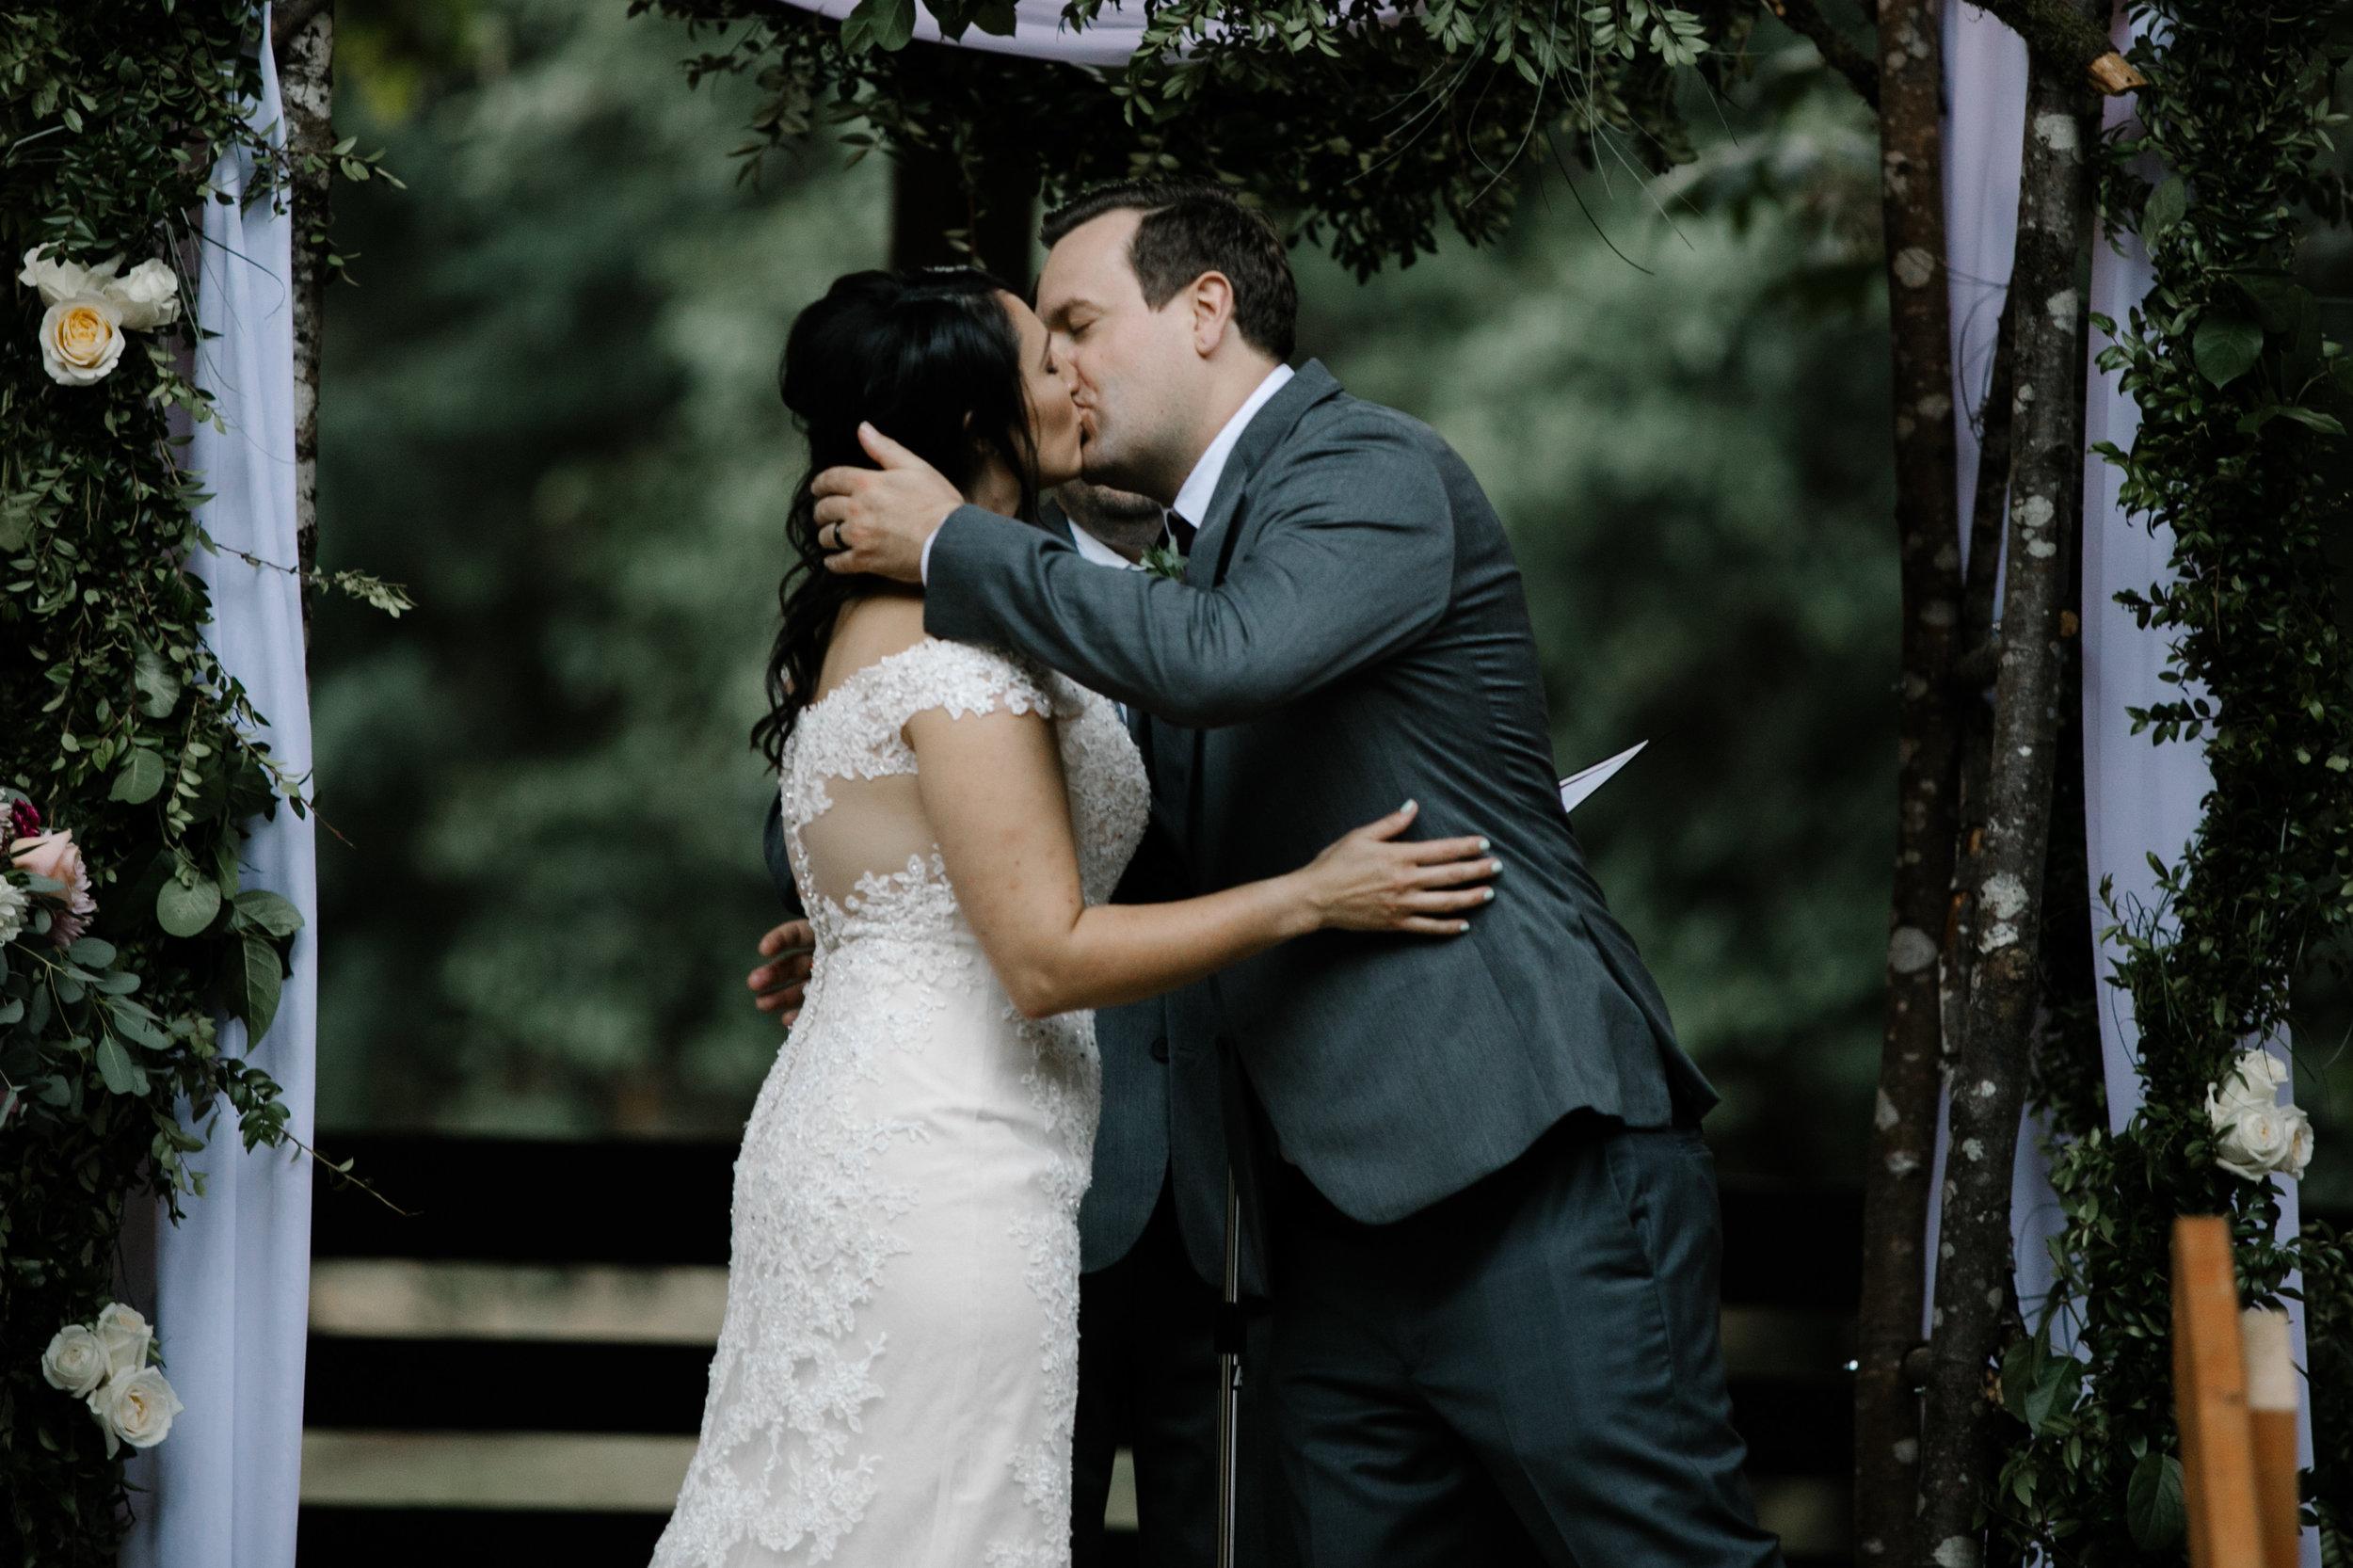 Sevlynn-Photography-Teresa-Chandler-Wedding-55.jpg